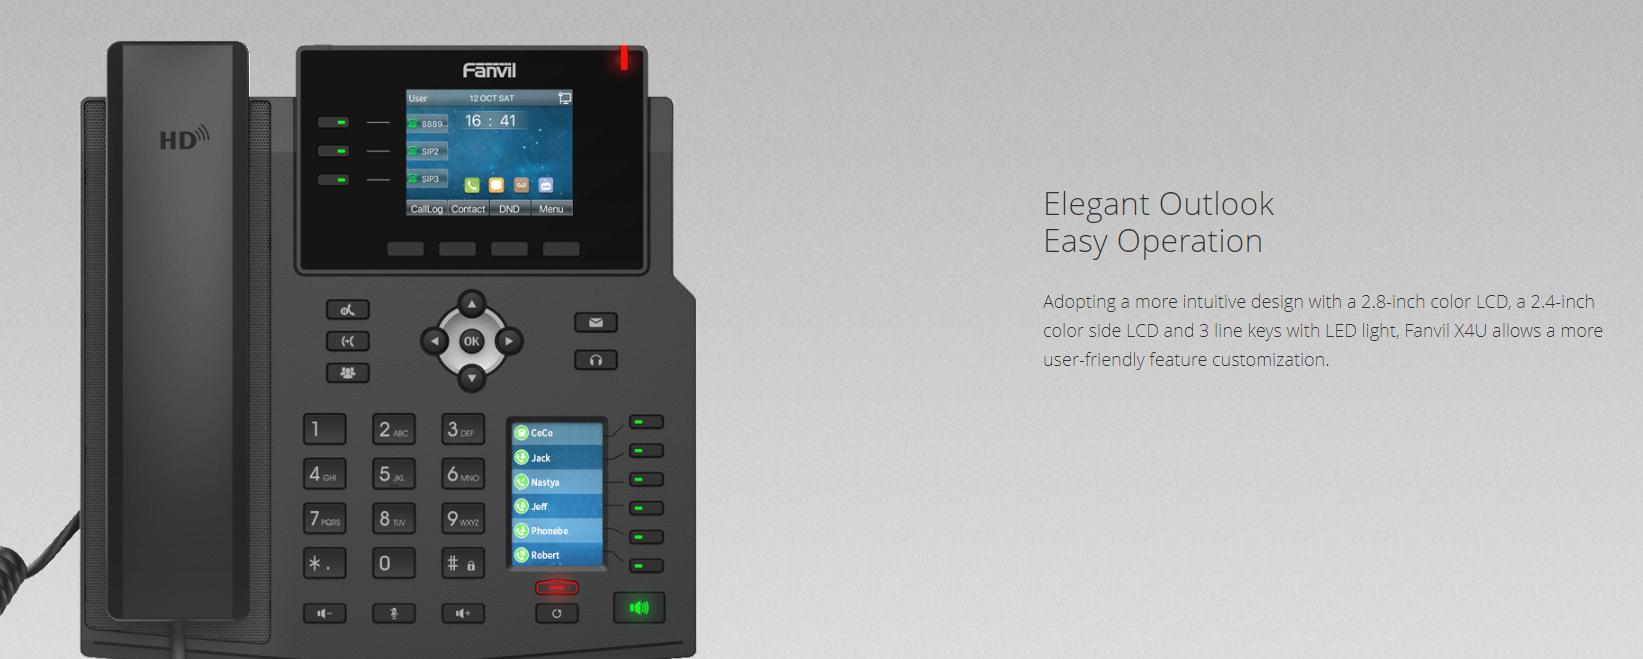 Fanvil X4U IP Phone (Gigabit, POE ) - Hong Kong Supplier - Sipmax Technology Group - 香港代理